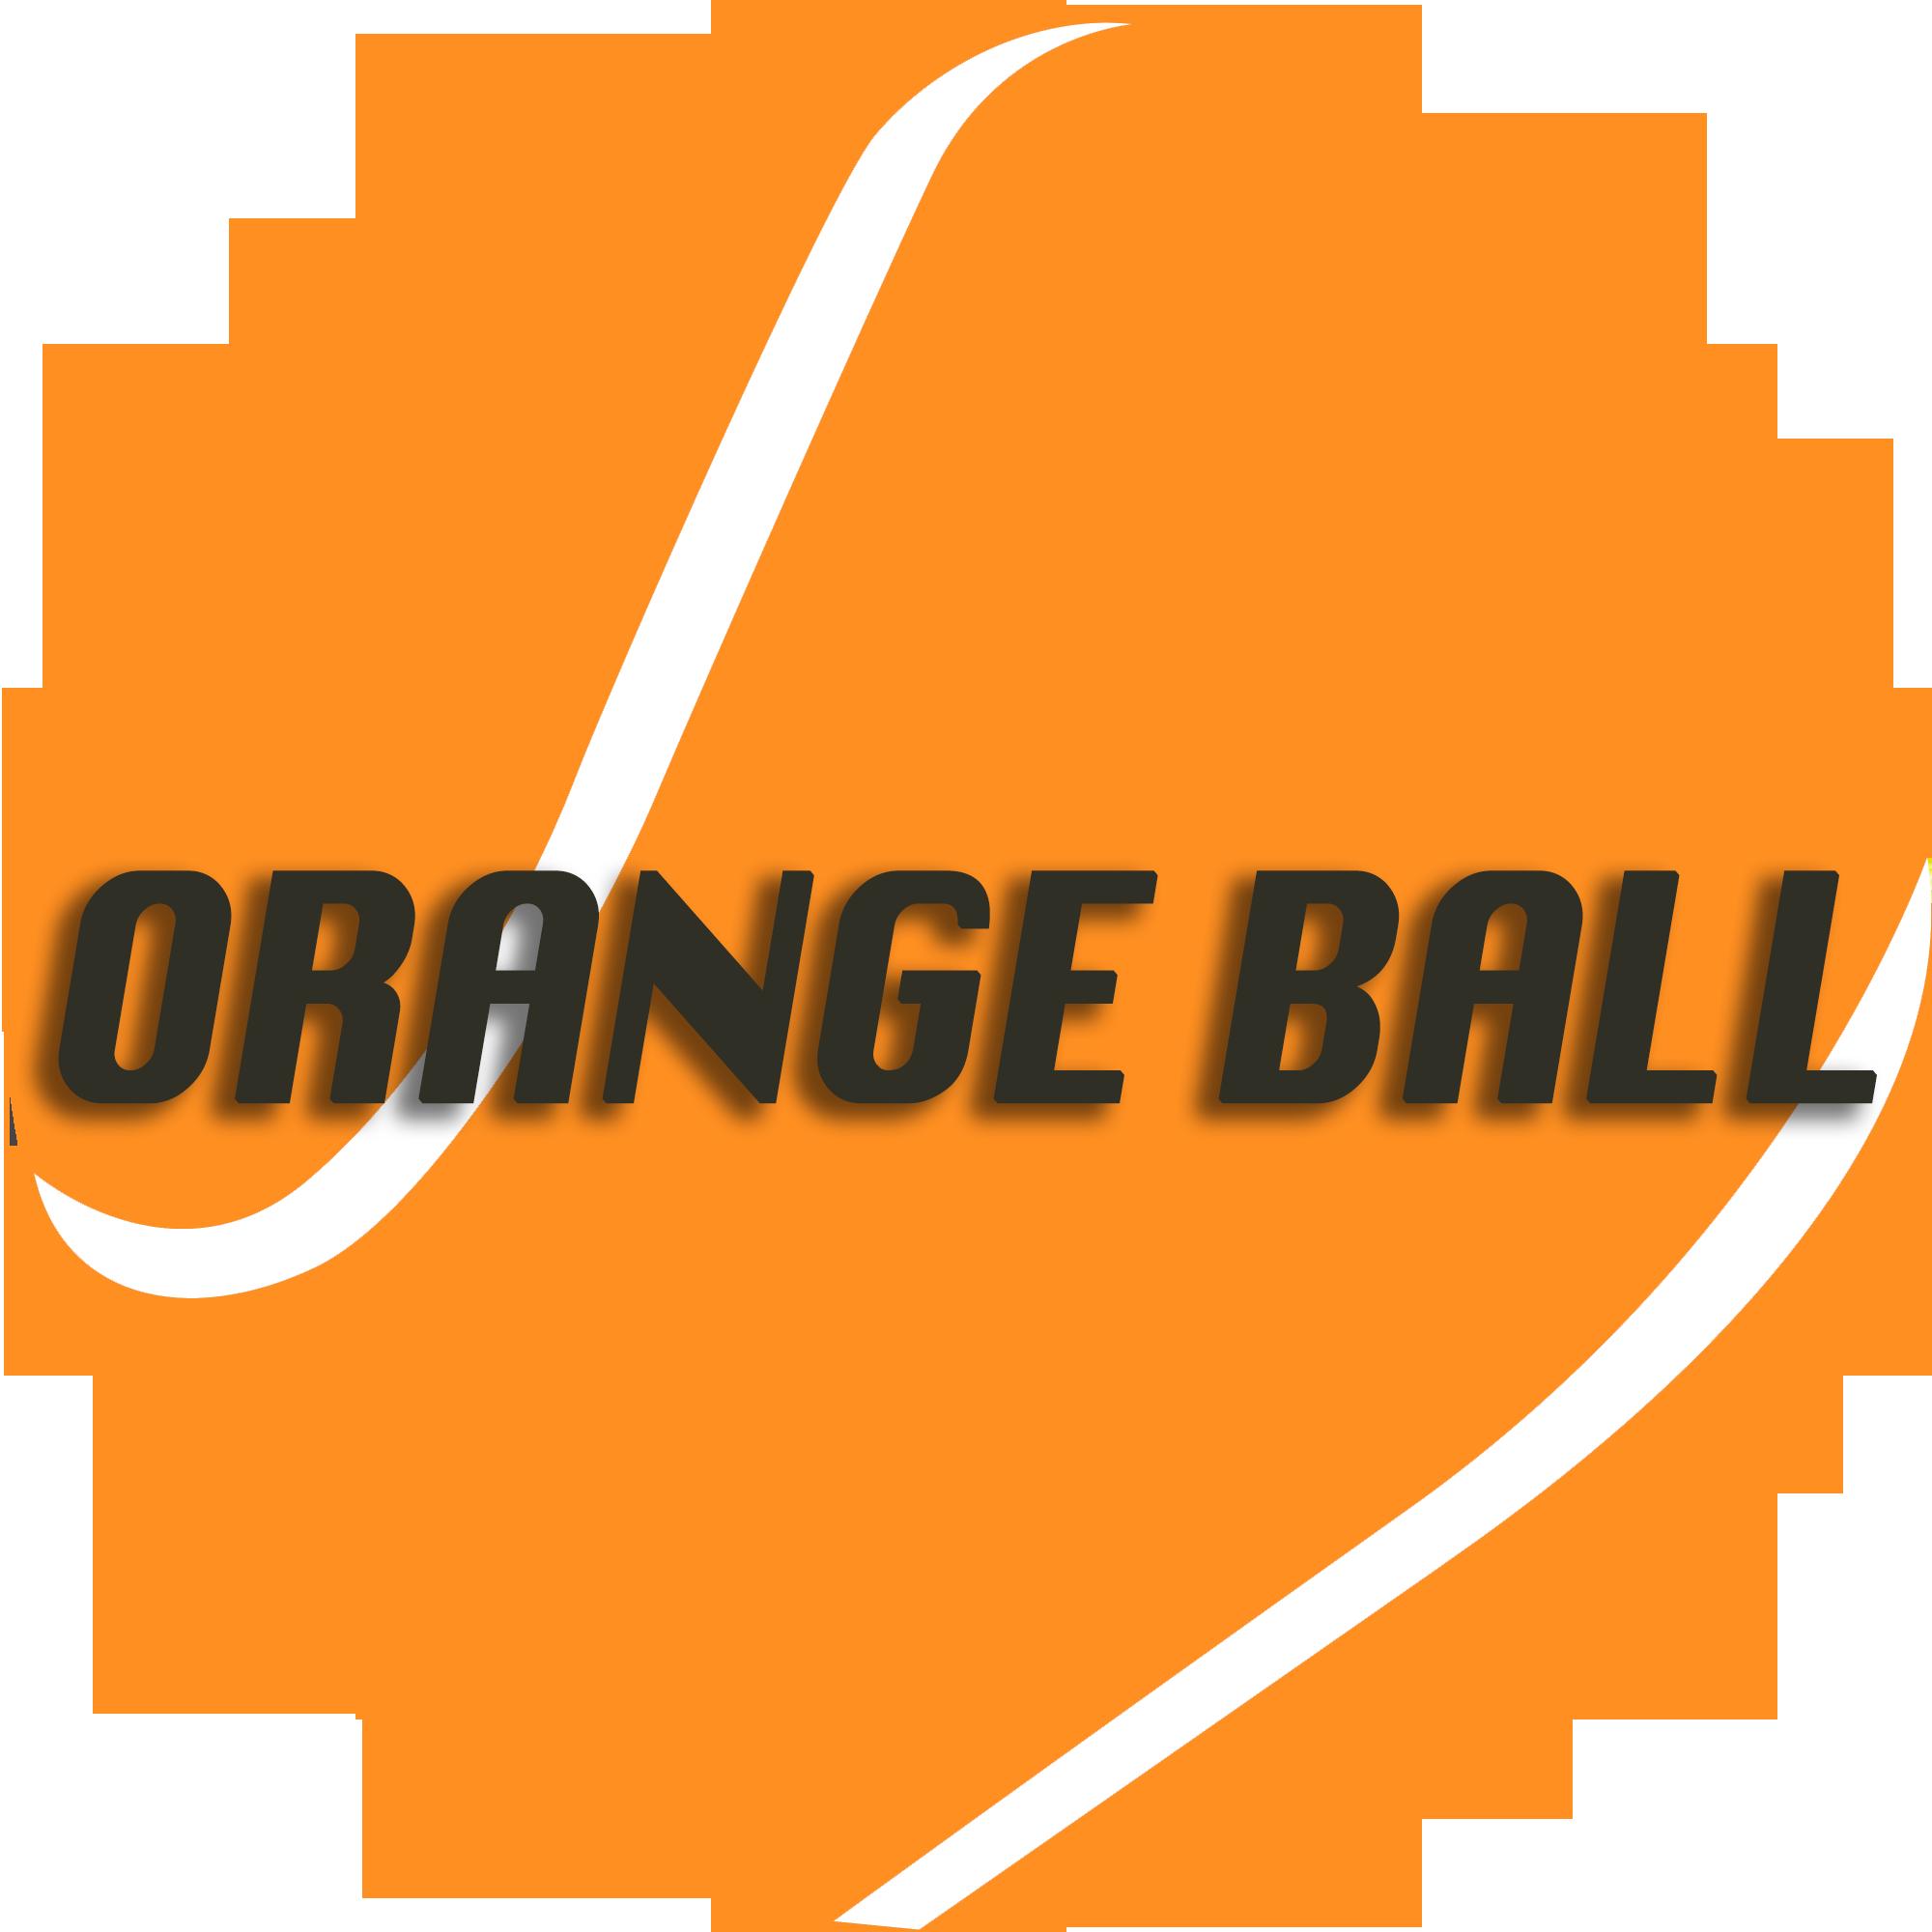 ORANGE_BALL_1